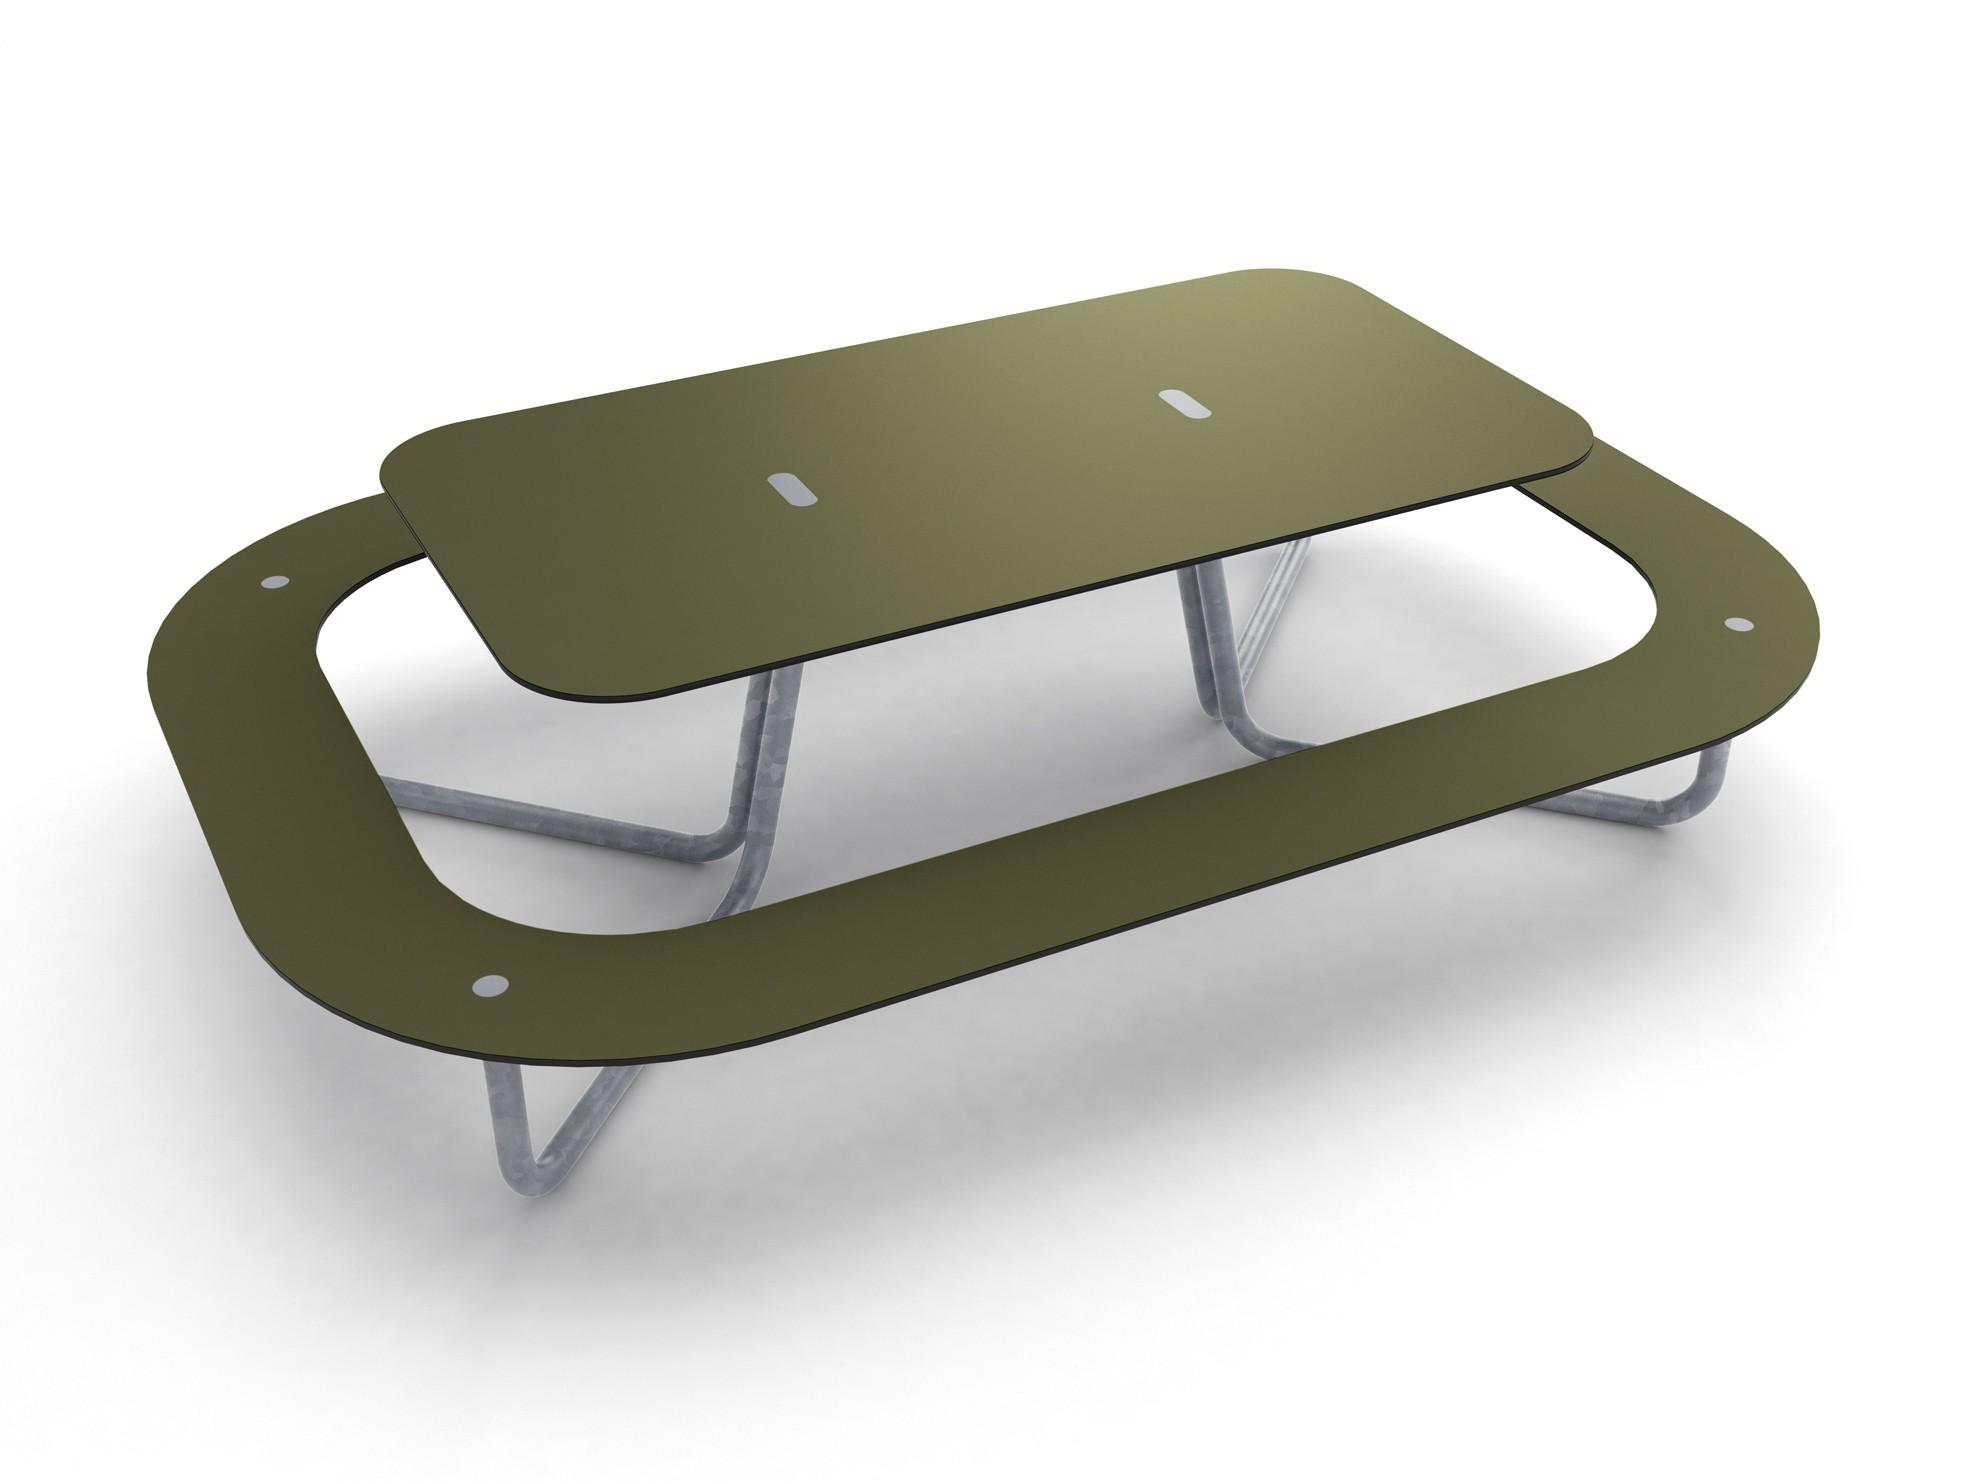 Plateau-O picknicktafel gemaakt van HPL - om aan te ontspannen of te lunchen